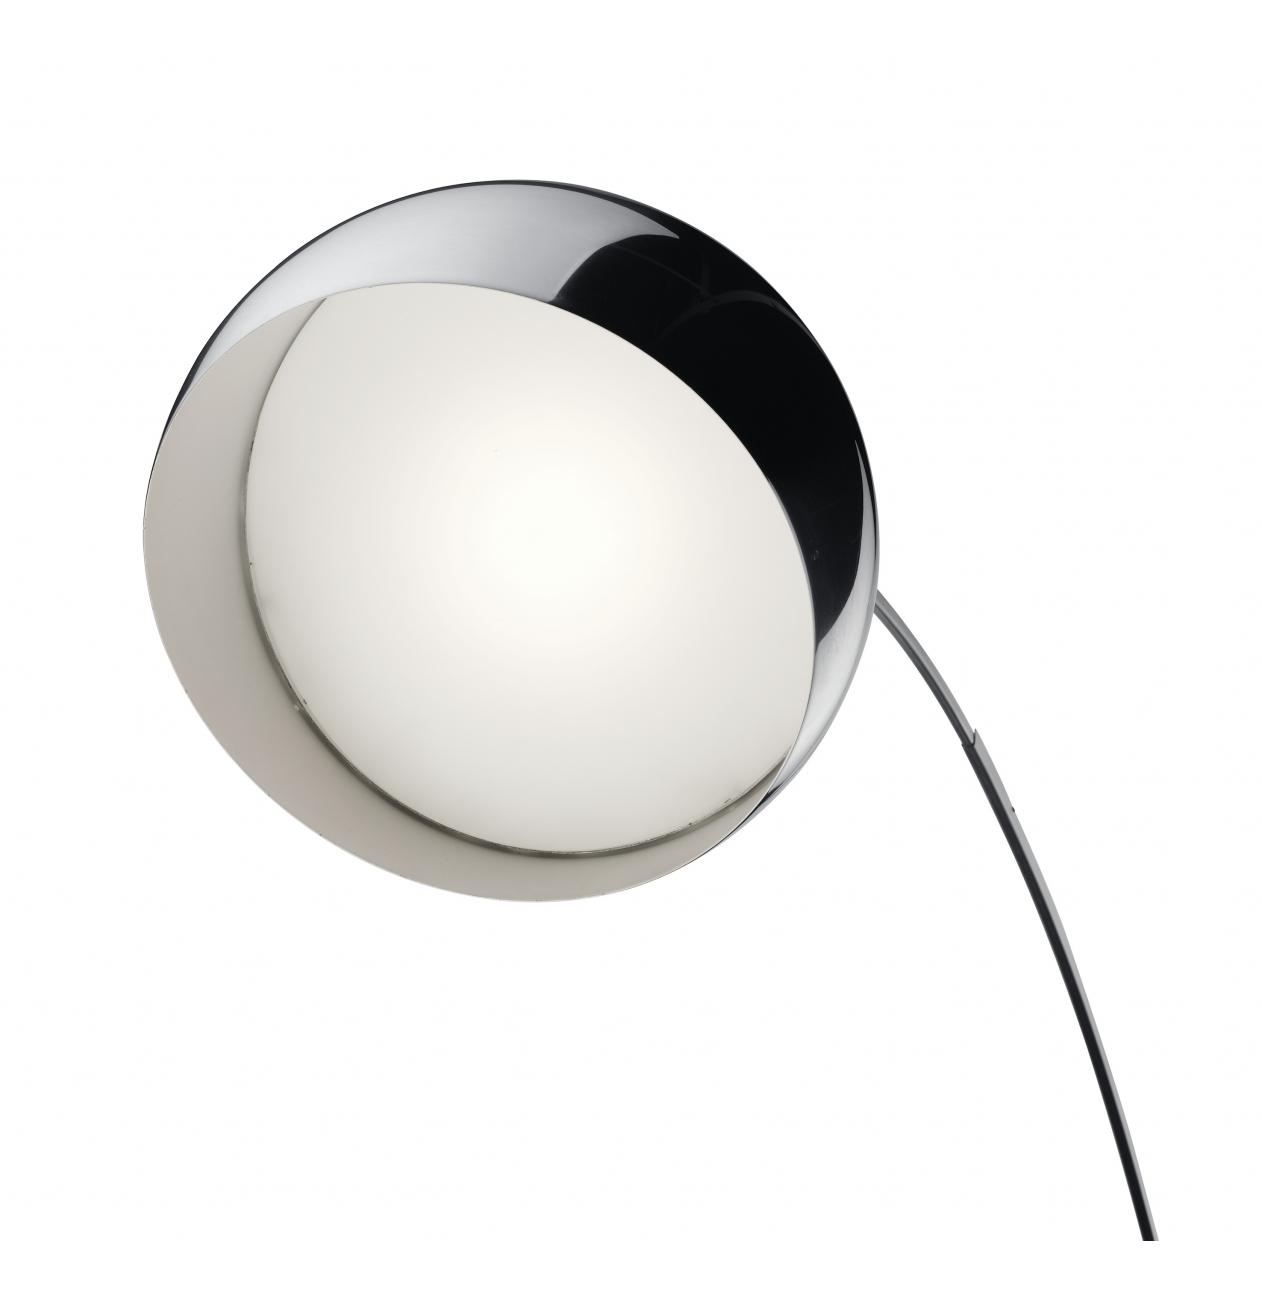 flos vloerlamp arco led versteeg lichtstudio. Black Bedroom Furniture Sets. Home Design Ideas